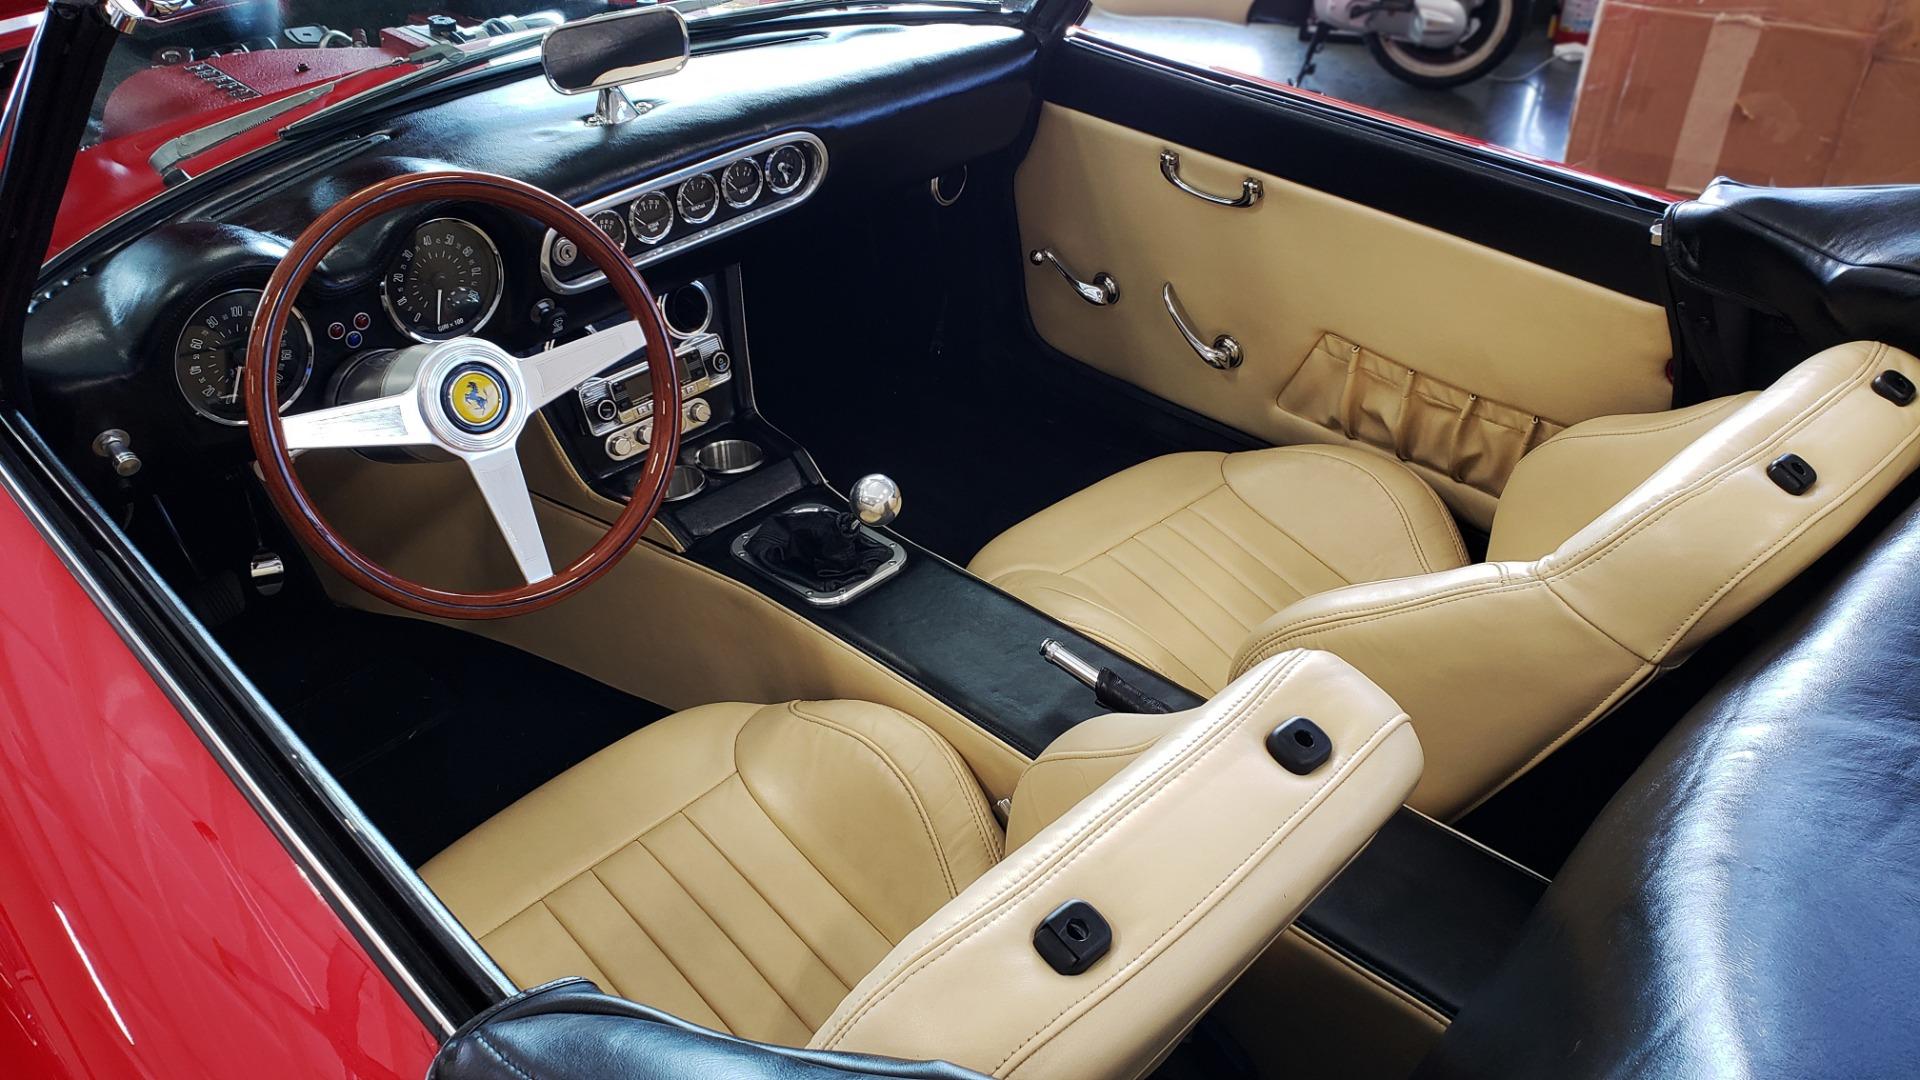 Used 1961 Ferrari 250GT SWB CALIFORNIA REPLICA / 302CI V8 / TREMEC 5-SPEED for sale Sold at Formula Imports in Charlotte NC 28227 73